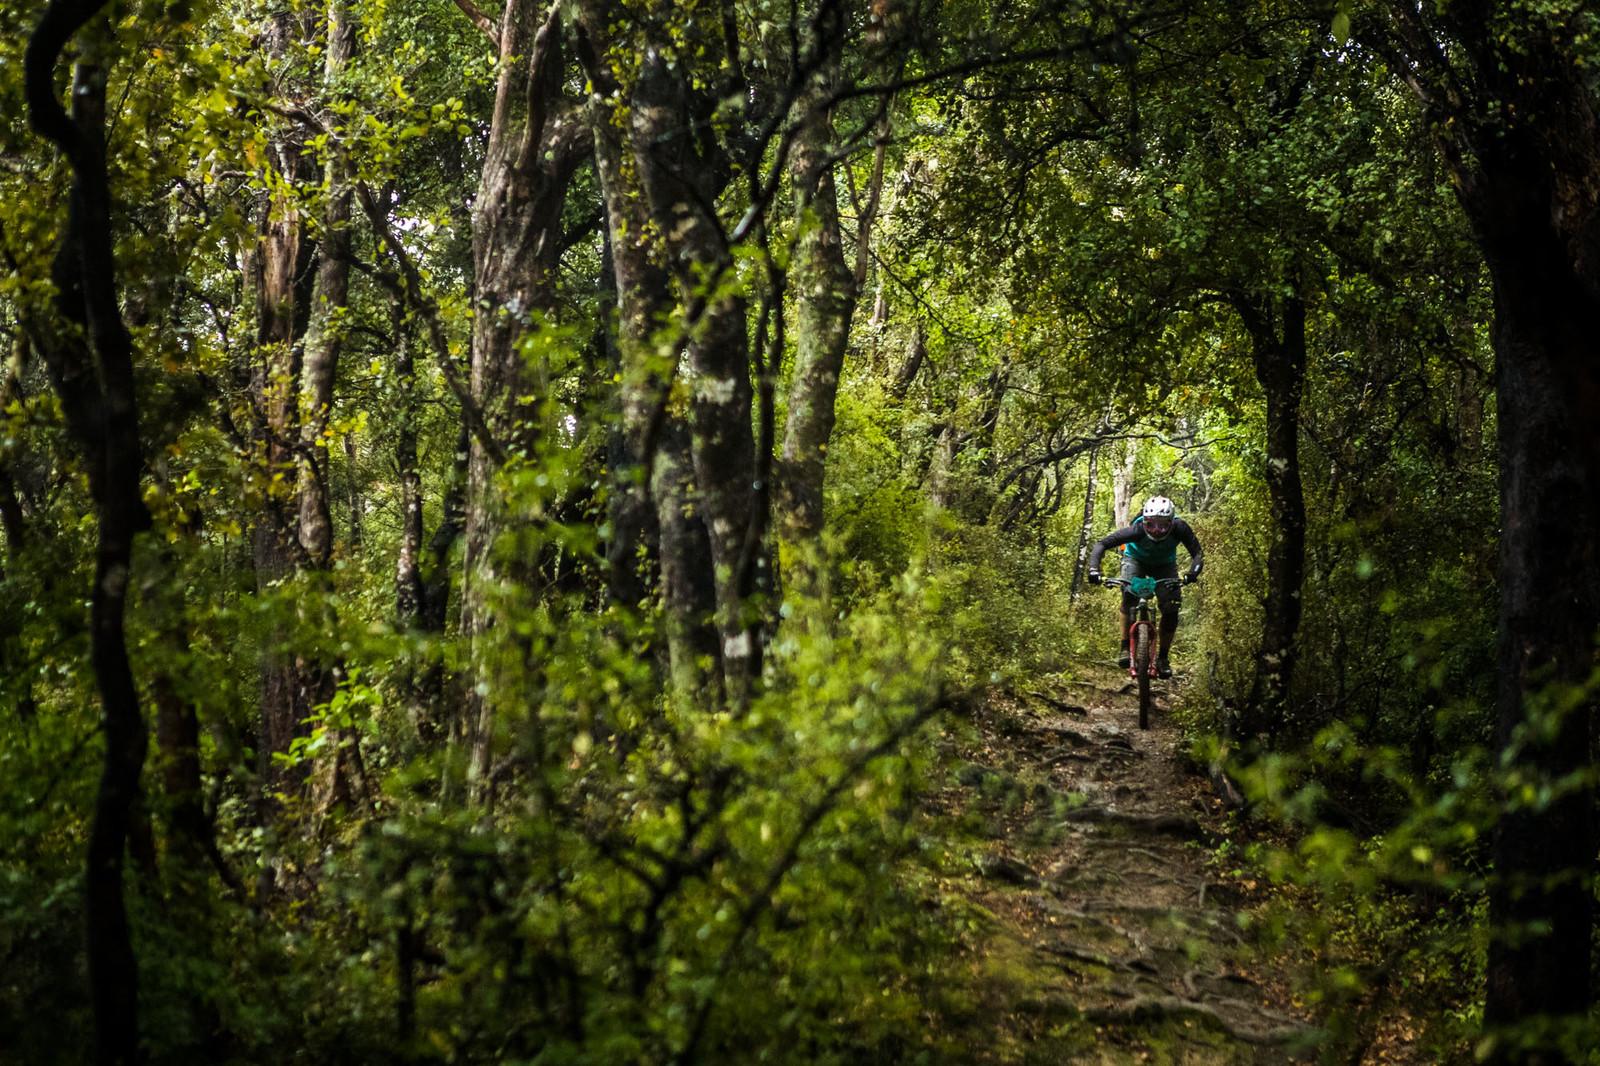 NZEnduro19 BB AS6I0126 - 2019 NZ Enduro Day 1 Photo Gallery - Mountain Biking Pictures - Vital MTB